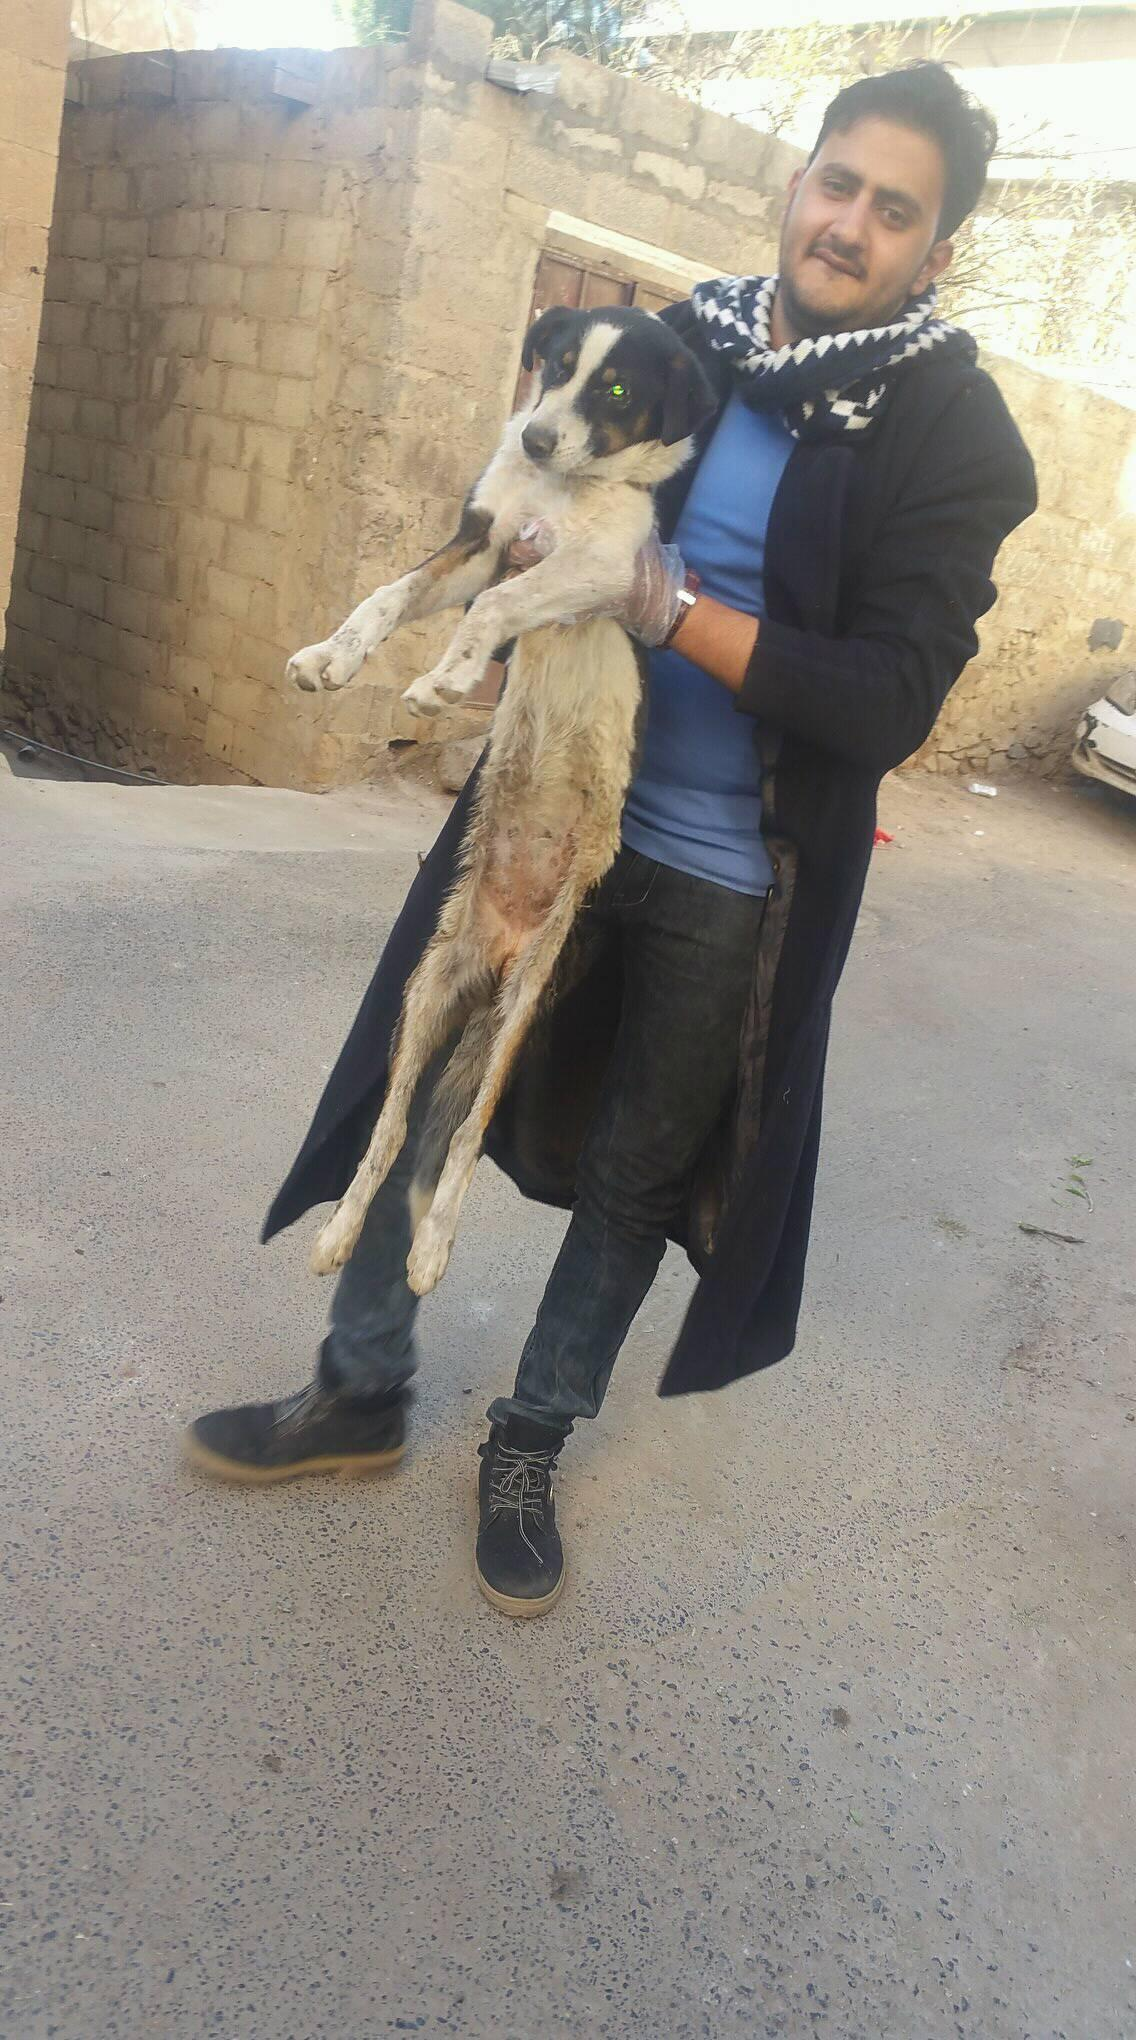 LUCY with Mohamed Qaten 26 DEC 2018 OWAP AR stray rescue mission sana'a yemen.jpg